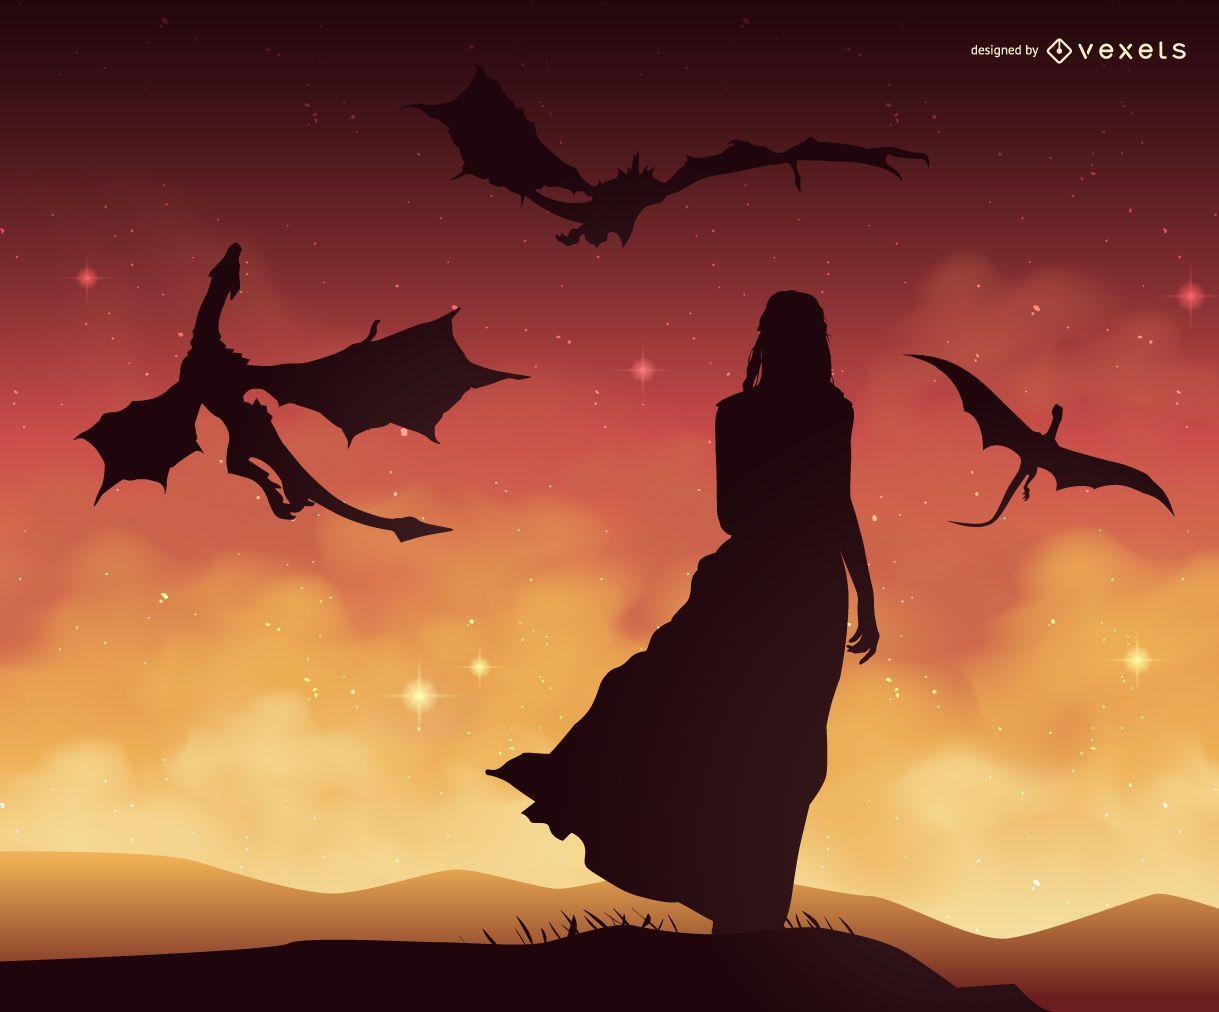 Game of Thrones illustration Daenerys Targaryen with dragons